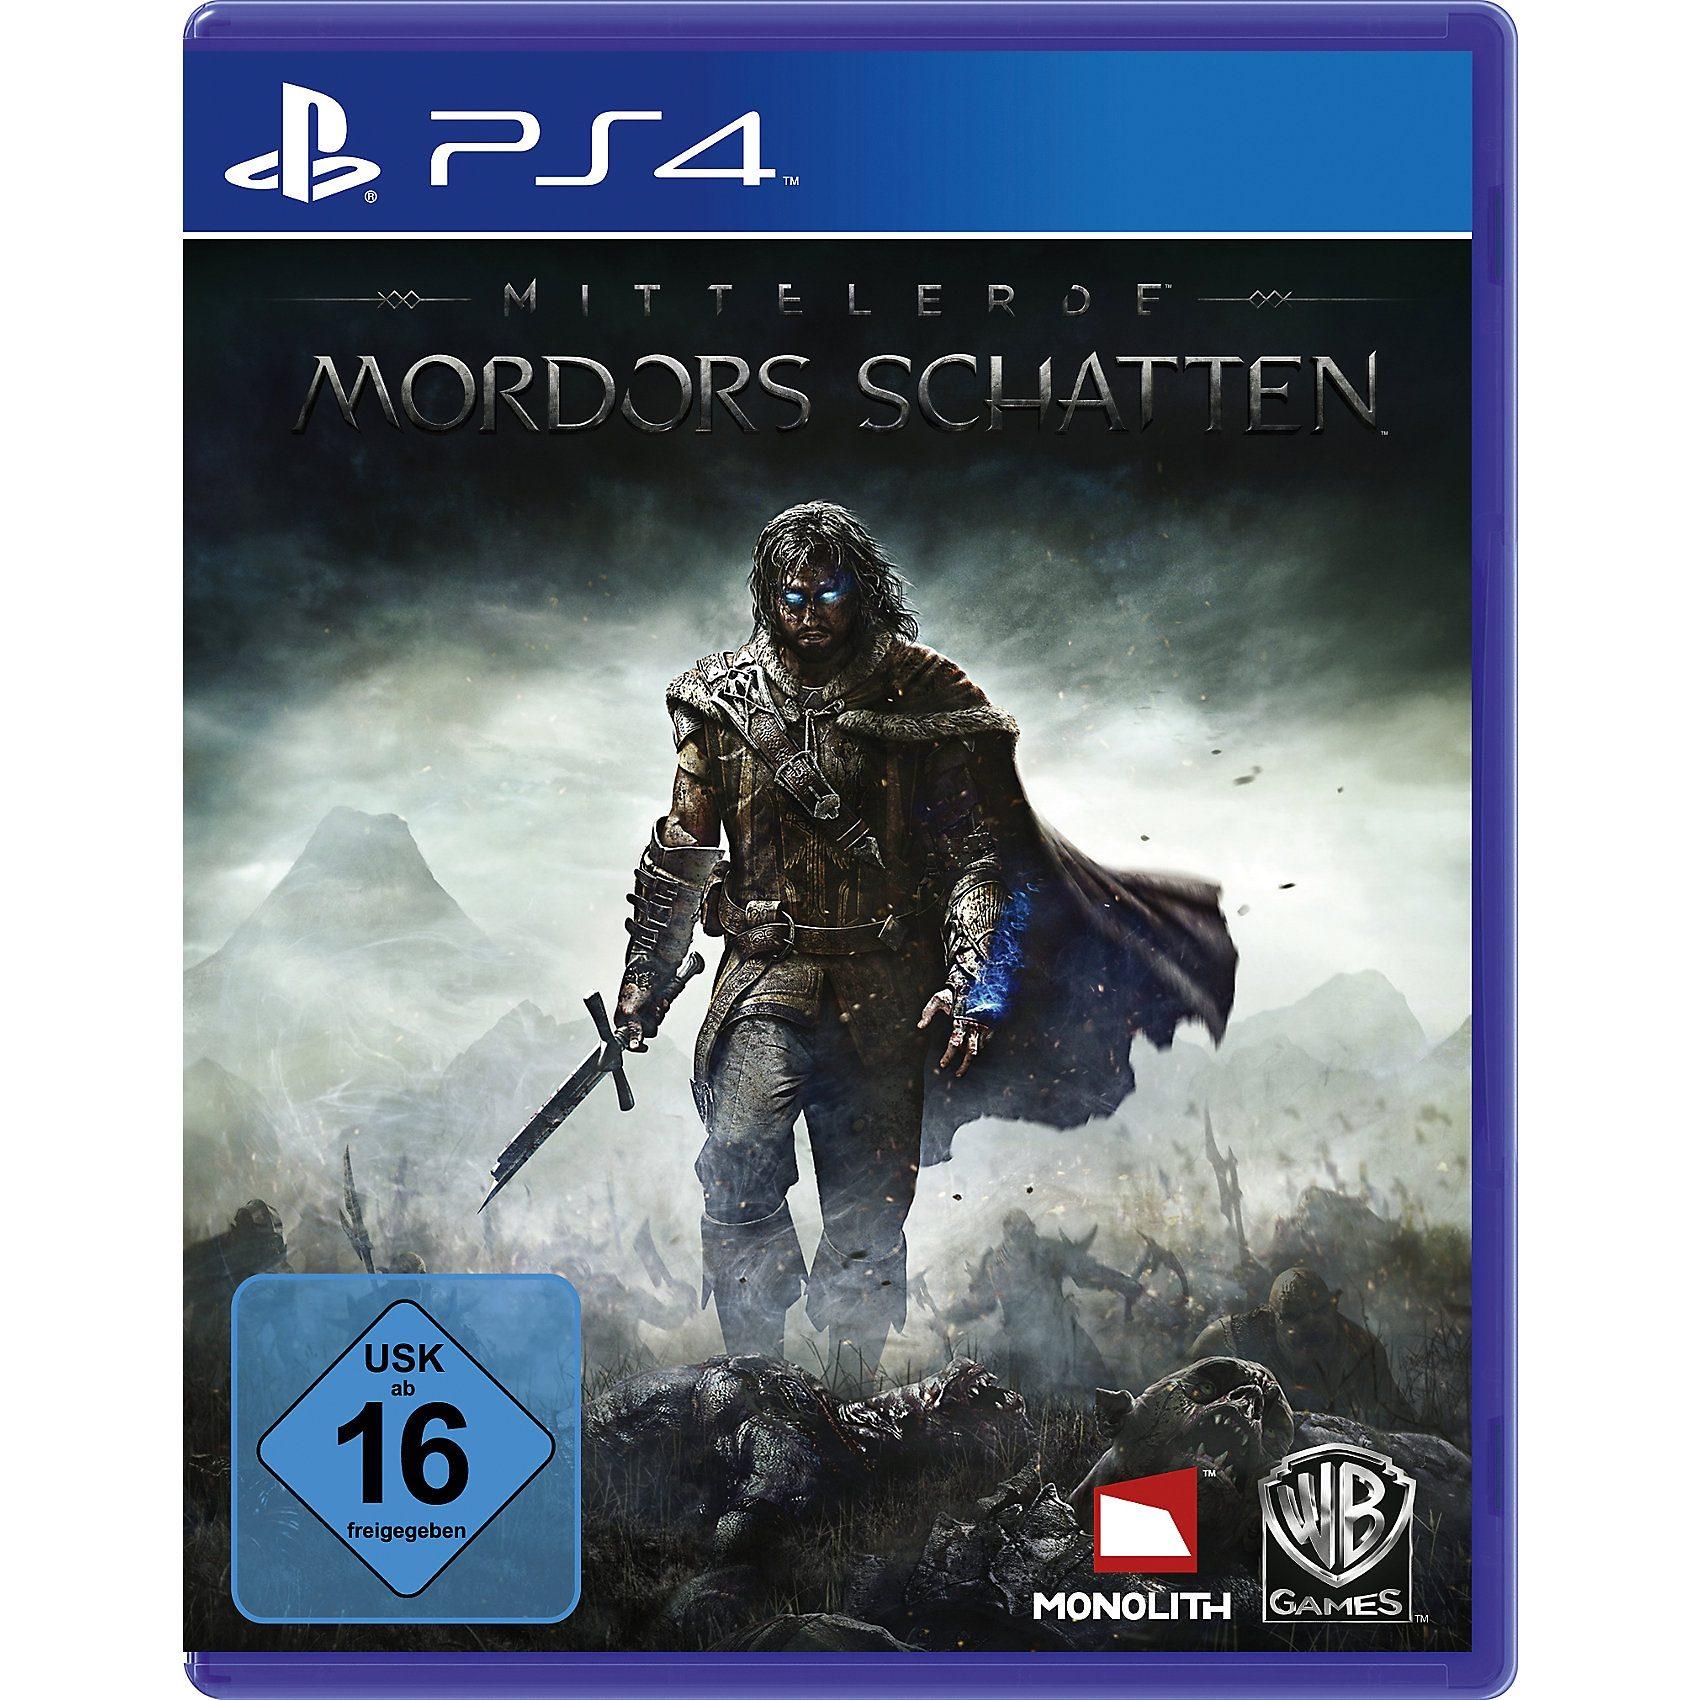 ak tronic PS4 Mittelerde: Mordors Schatten